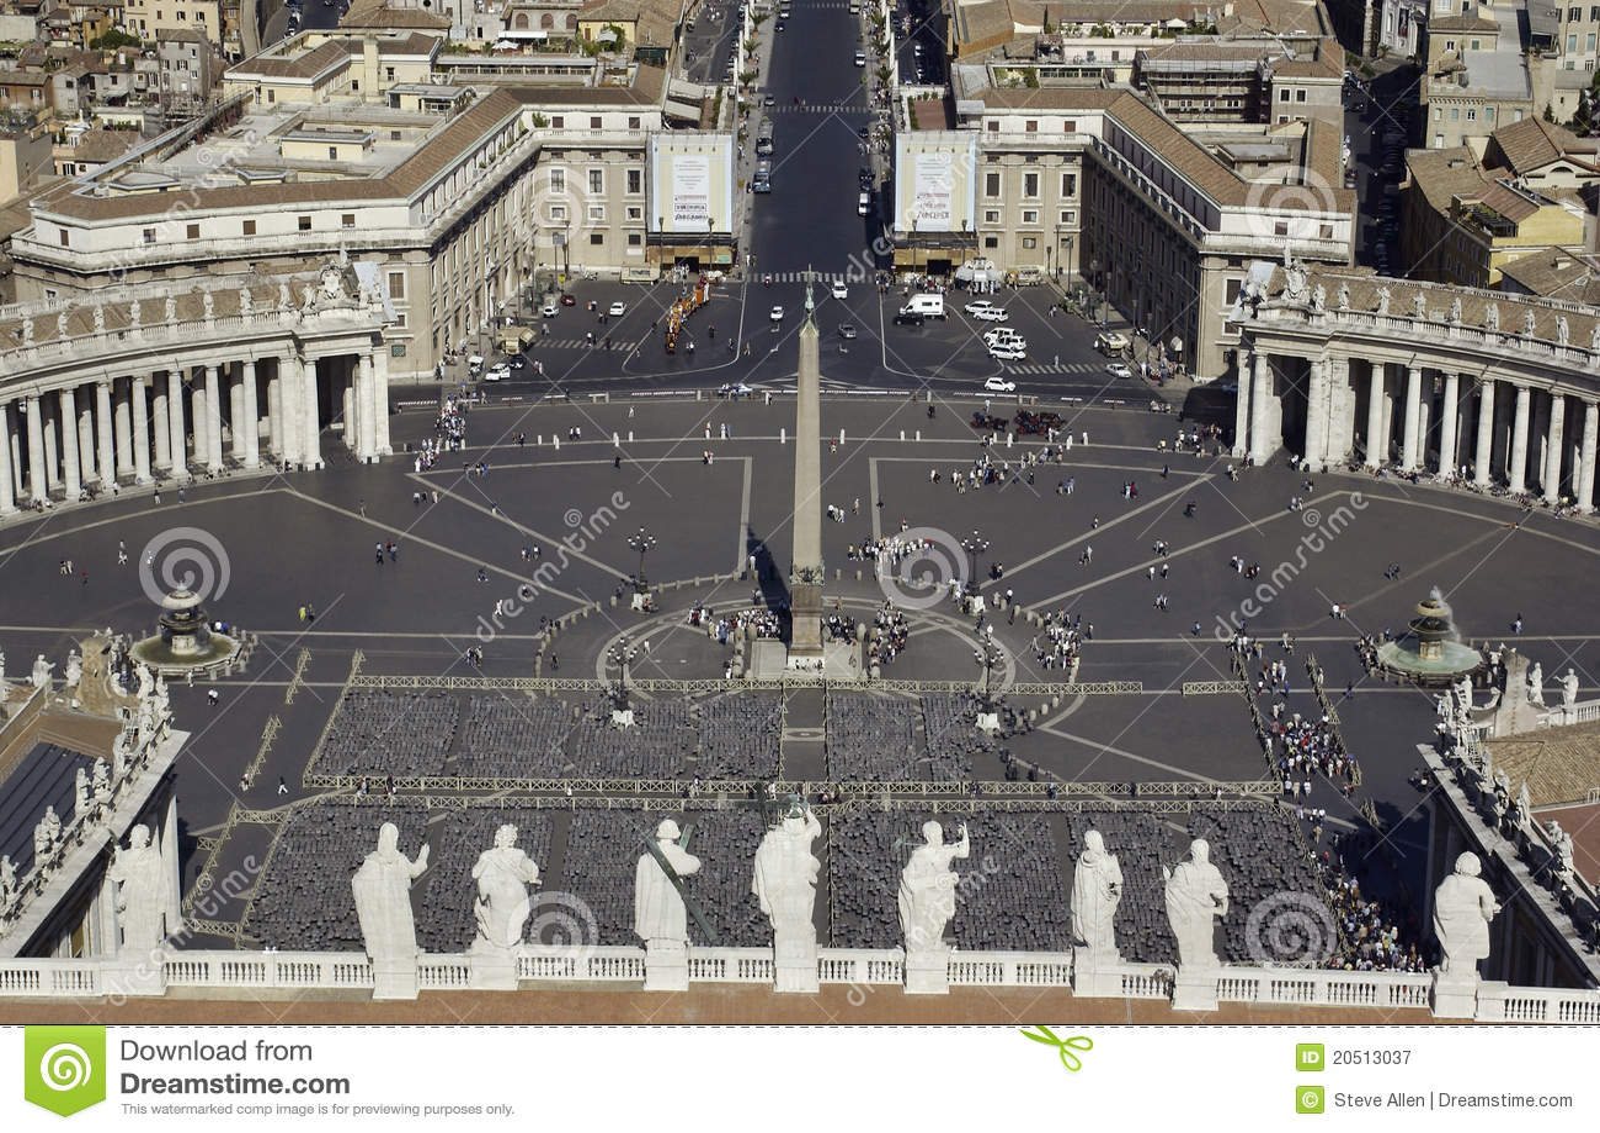 Vatican - cuadrado del St. Peters - Roma - Italia